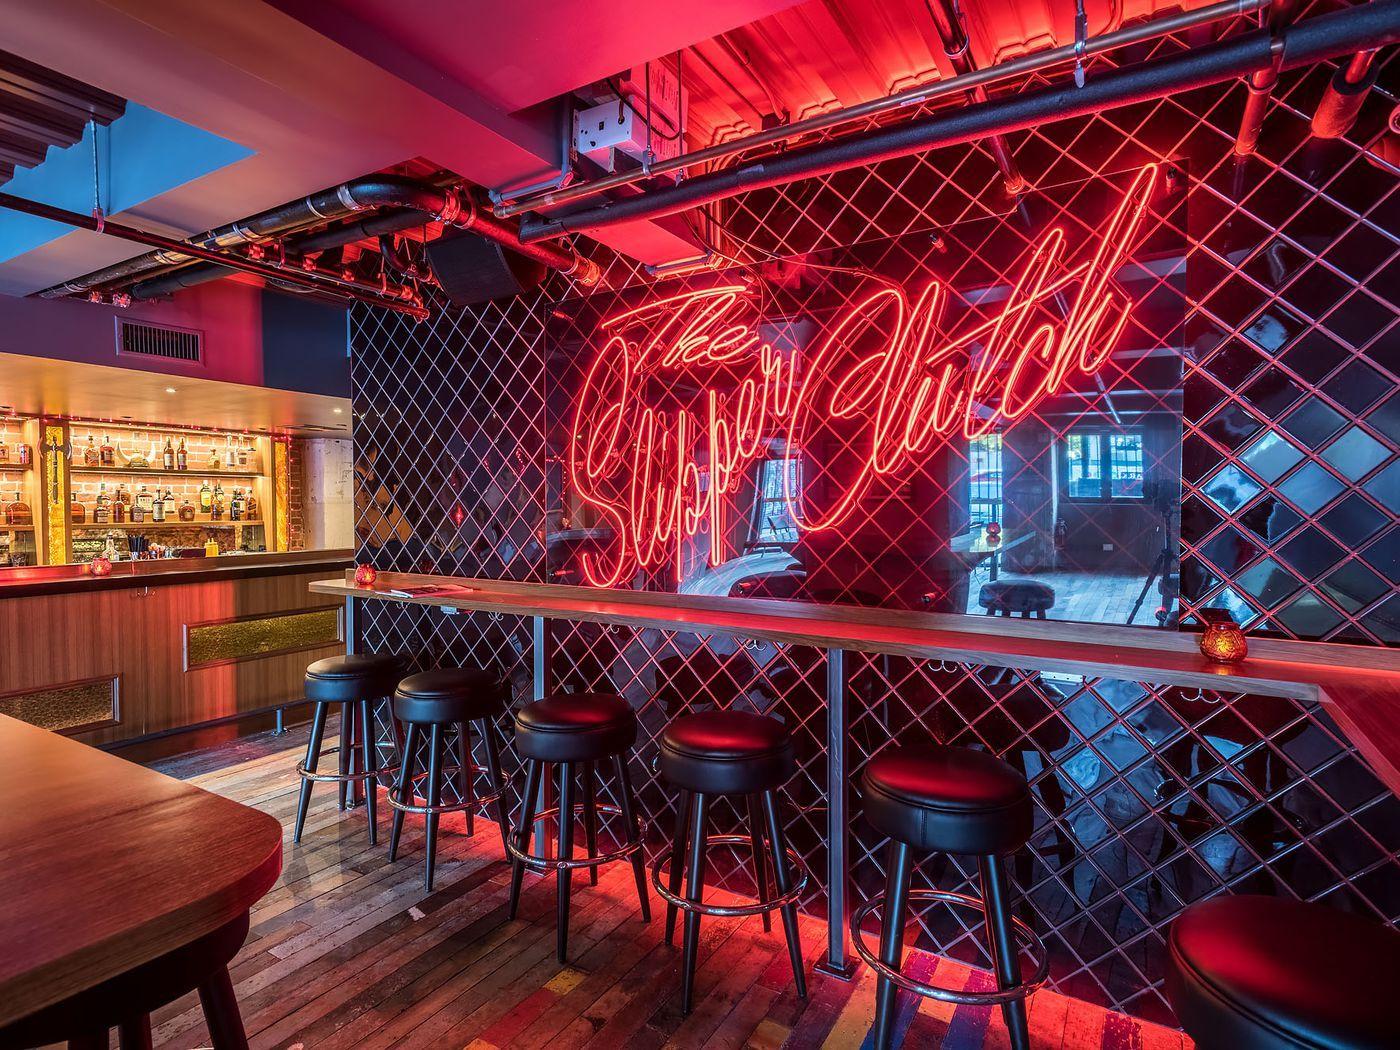 Downtown S Secretive 80s Bar Is The Perfect Throwback Hang Bar Interior Design Bar Design Restaurant Cocktail Bar Design